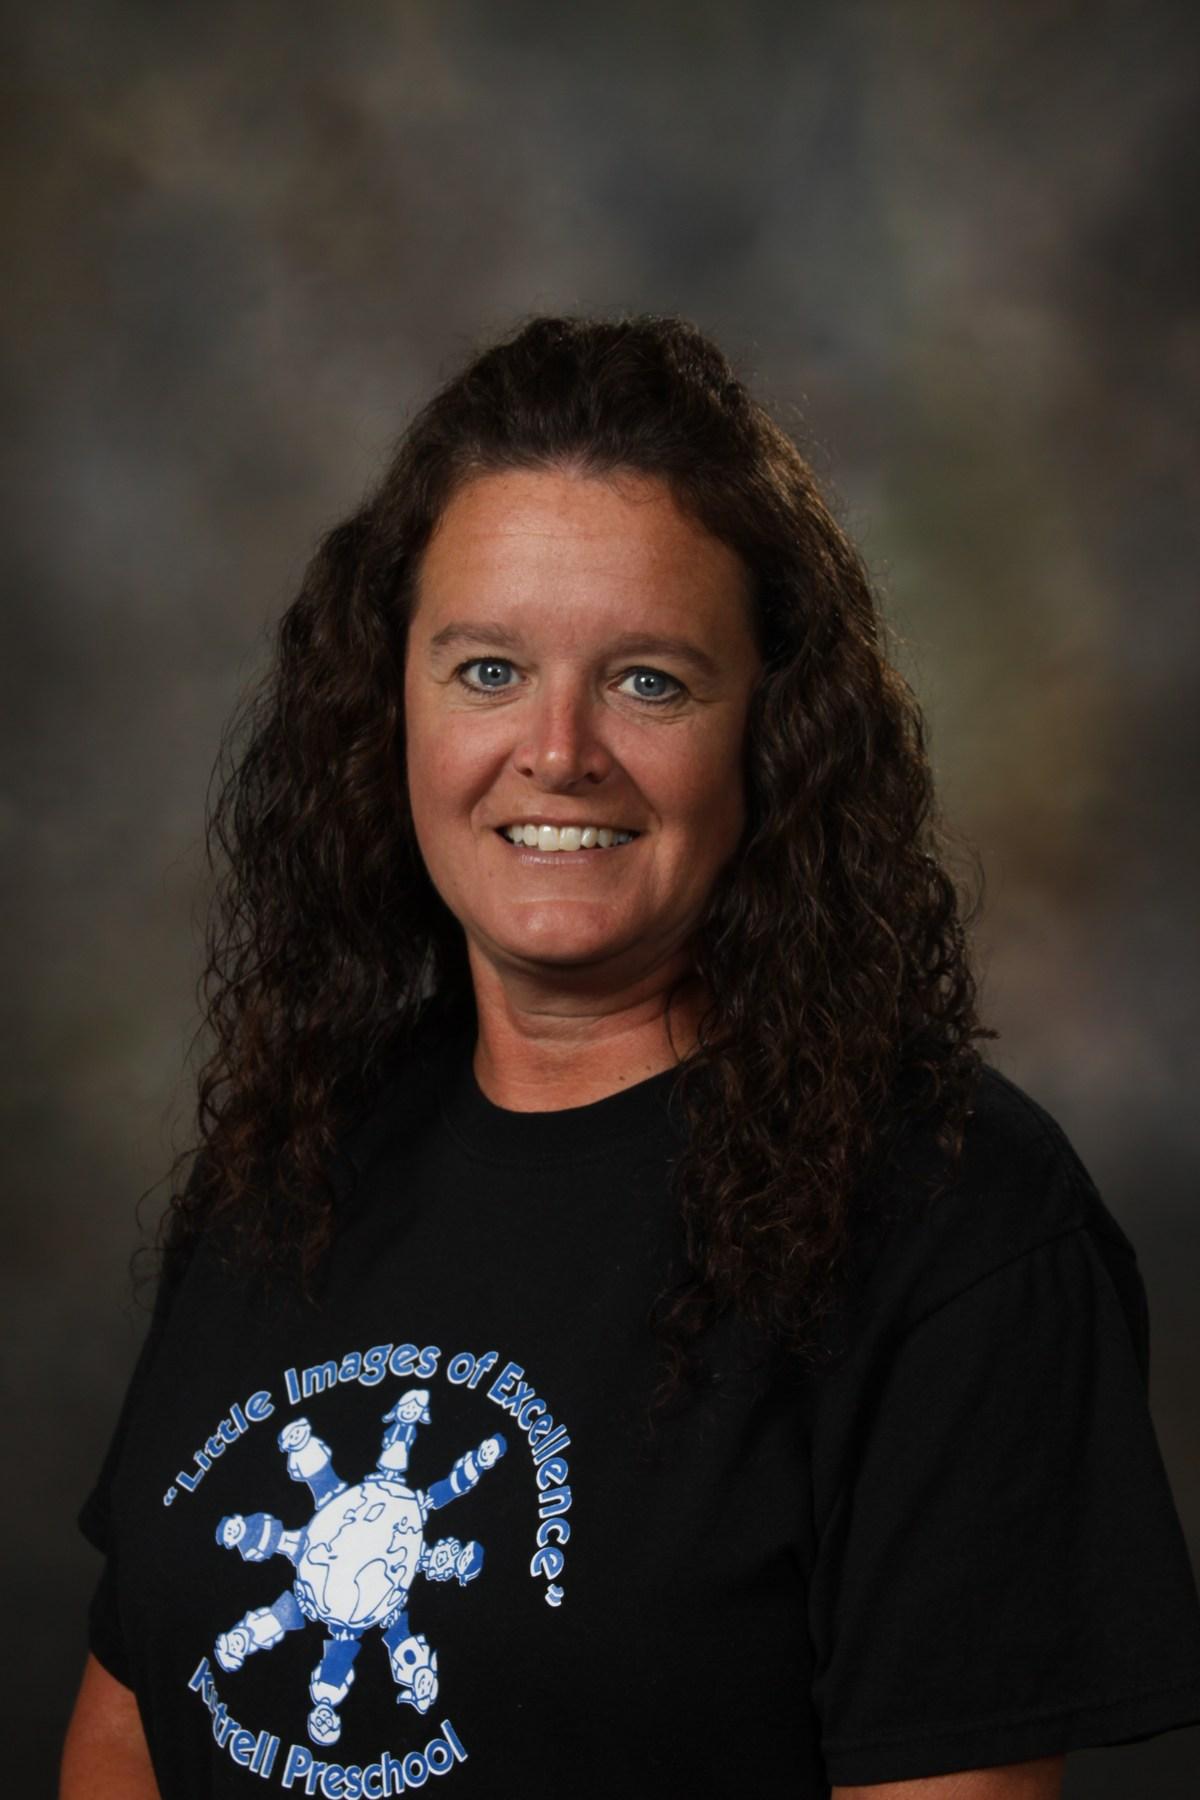 Ms. Rowland